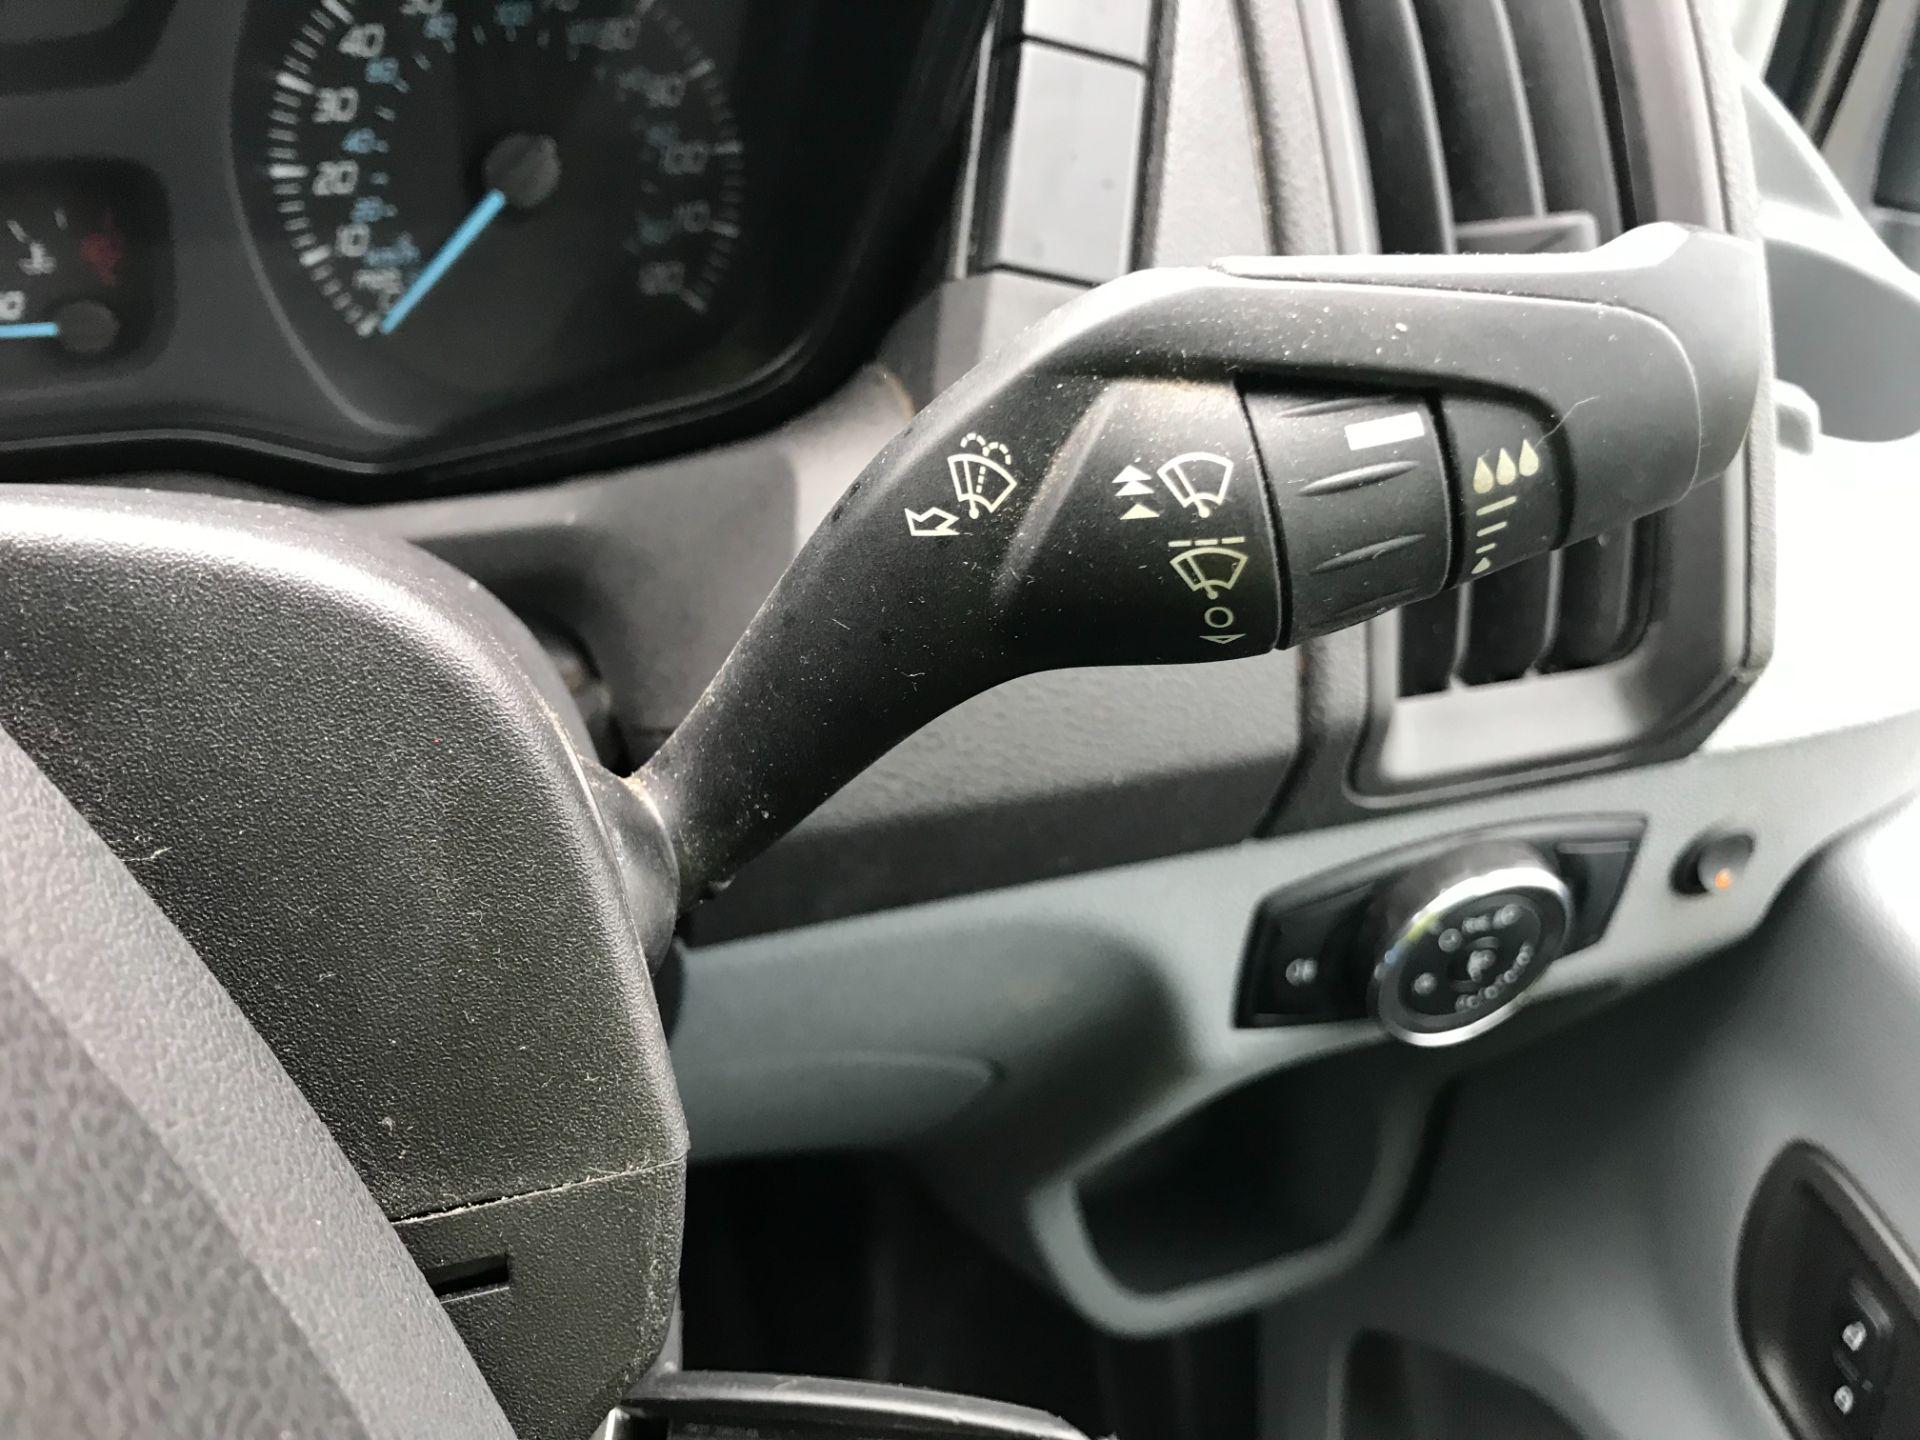 2018 Ford Transit 2.0 Tdci 130 L2 H2 EURO 6 (FG18YJM) Image 34